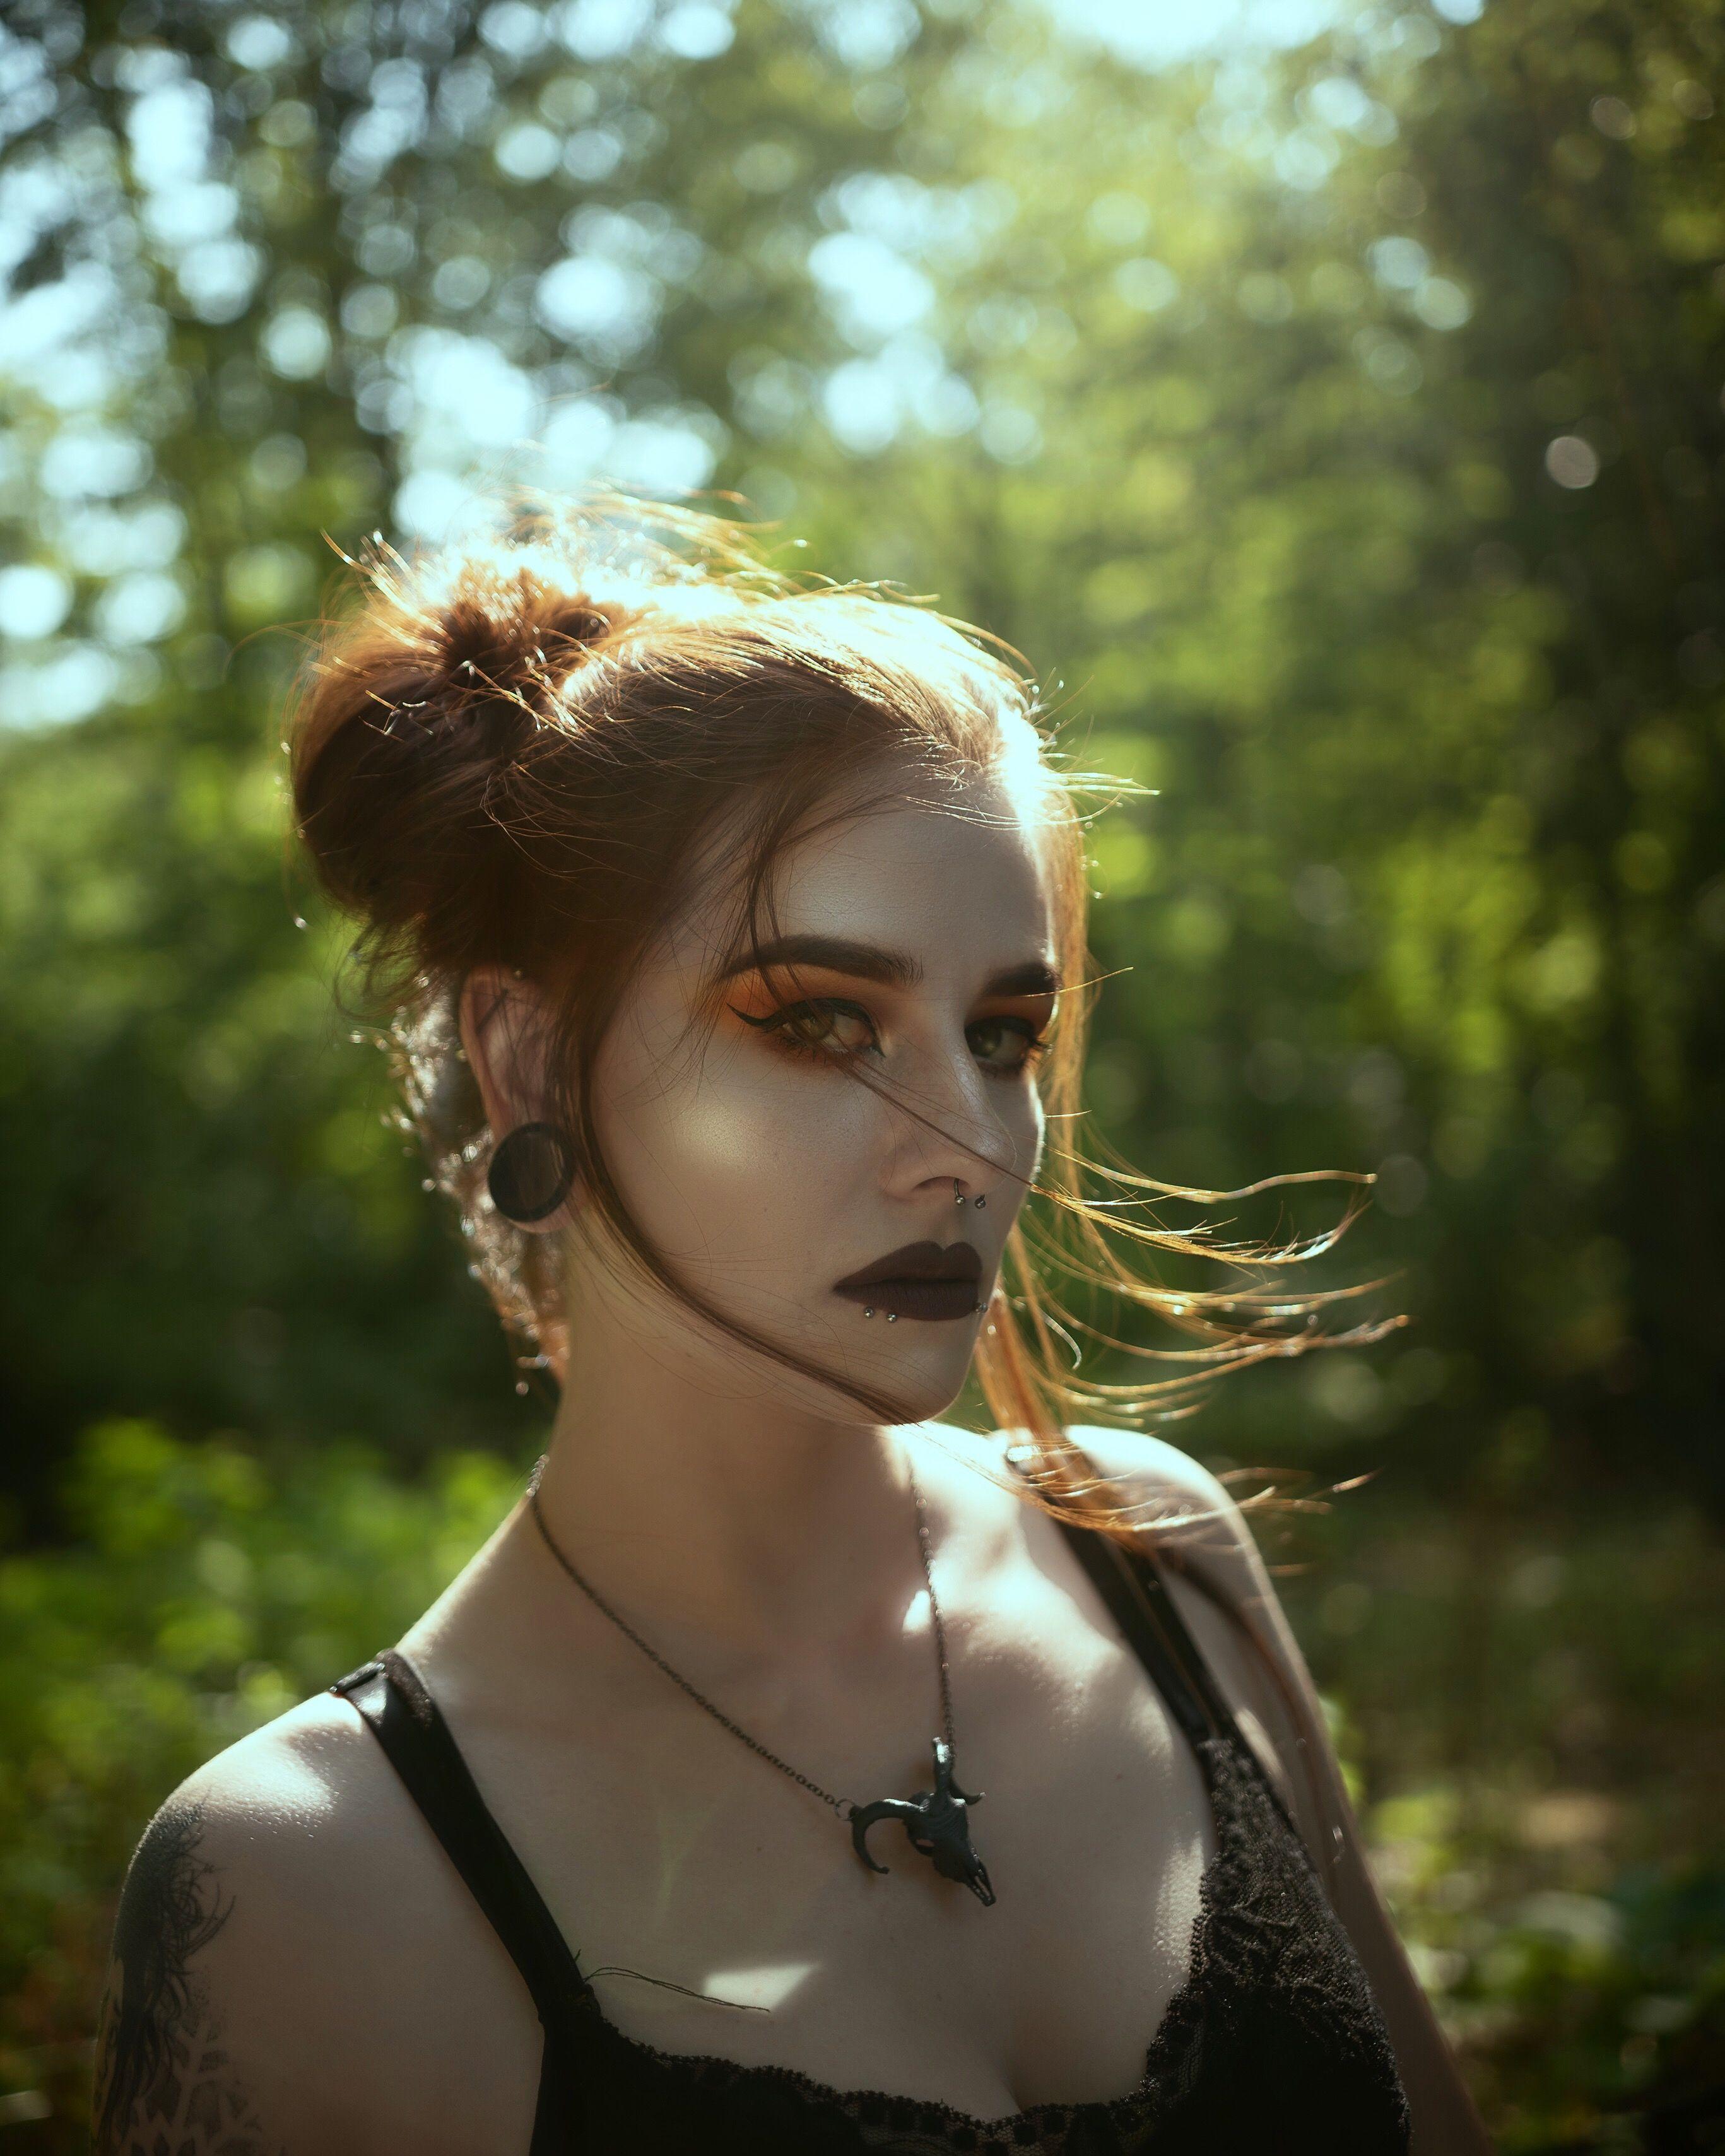 #nebarius #gothic #goth #gothicgirl #gothgirl #alternativemodel #alternativegirl #alternativefashion #alternative #gothmodel #gothicmodel #model #modeling #modelka #piercing #kolczyki #gotyk #gothicdress #nugoth #nugothfashion #gothfashion #gothicfashion #tattoo #tattoos #tatuaz #makeup #alternativemakeup #gothicmakeup #darkfashion